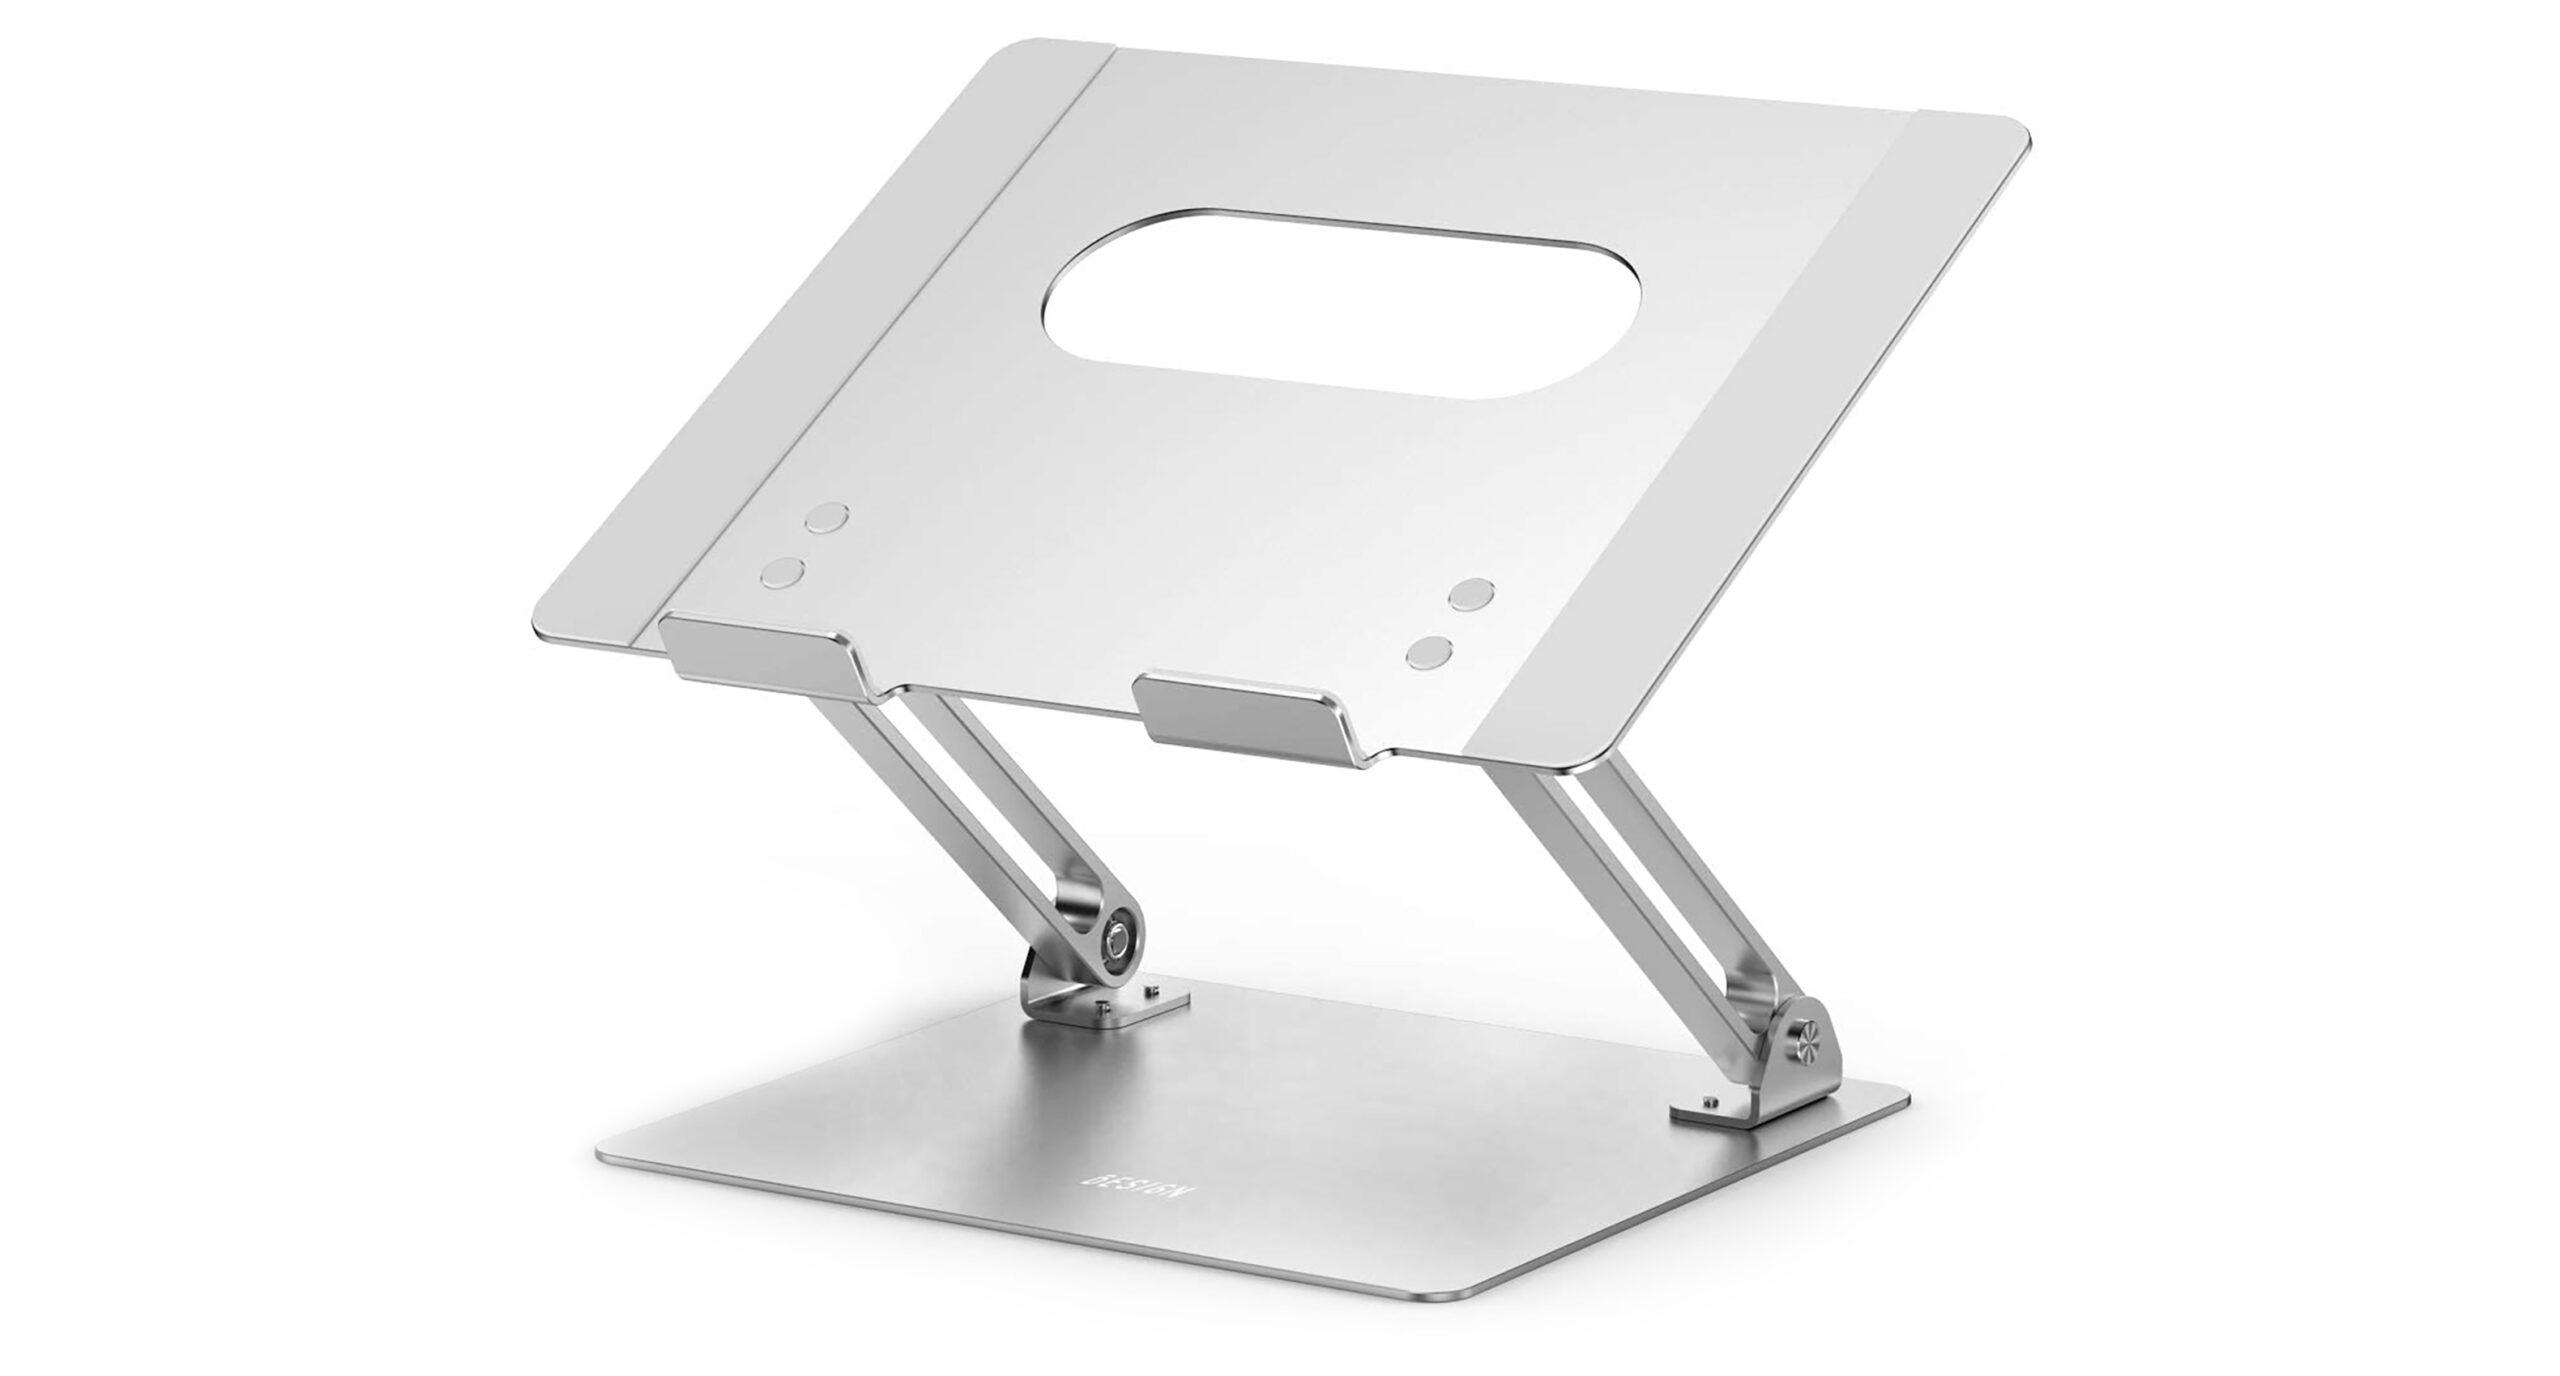 Besign laptop stand